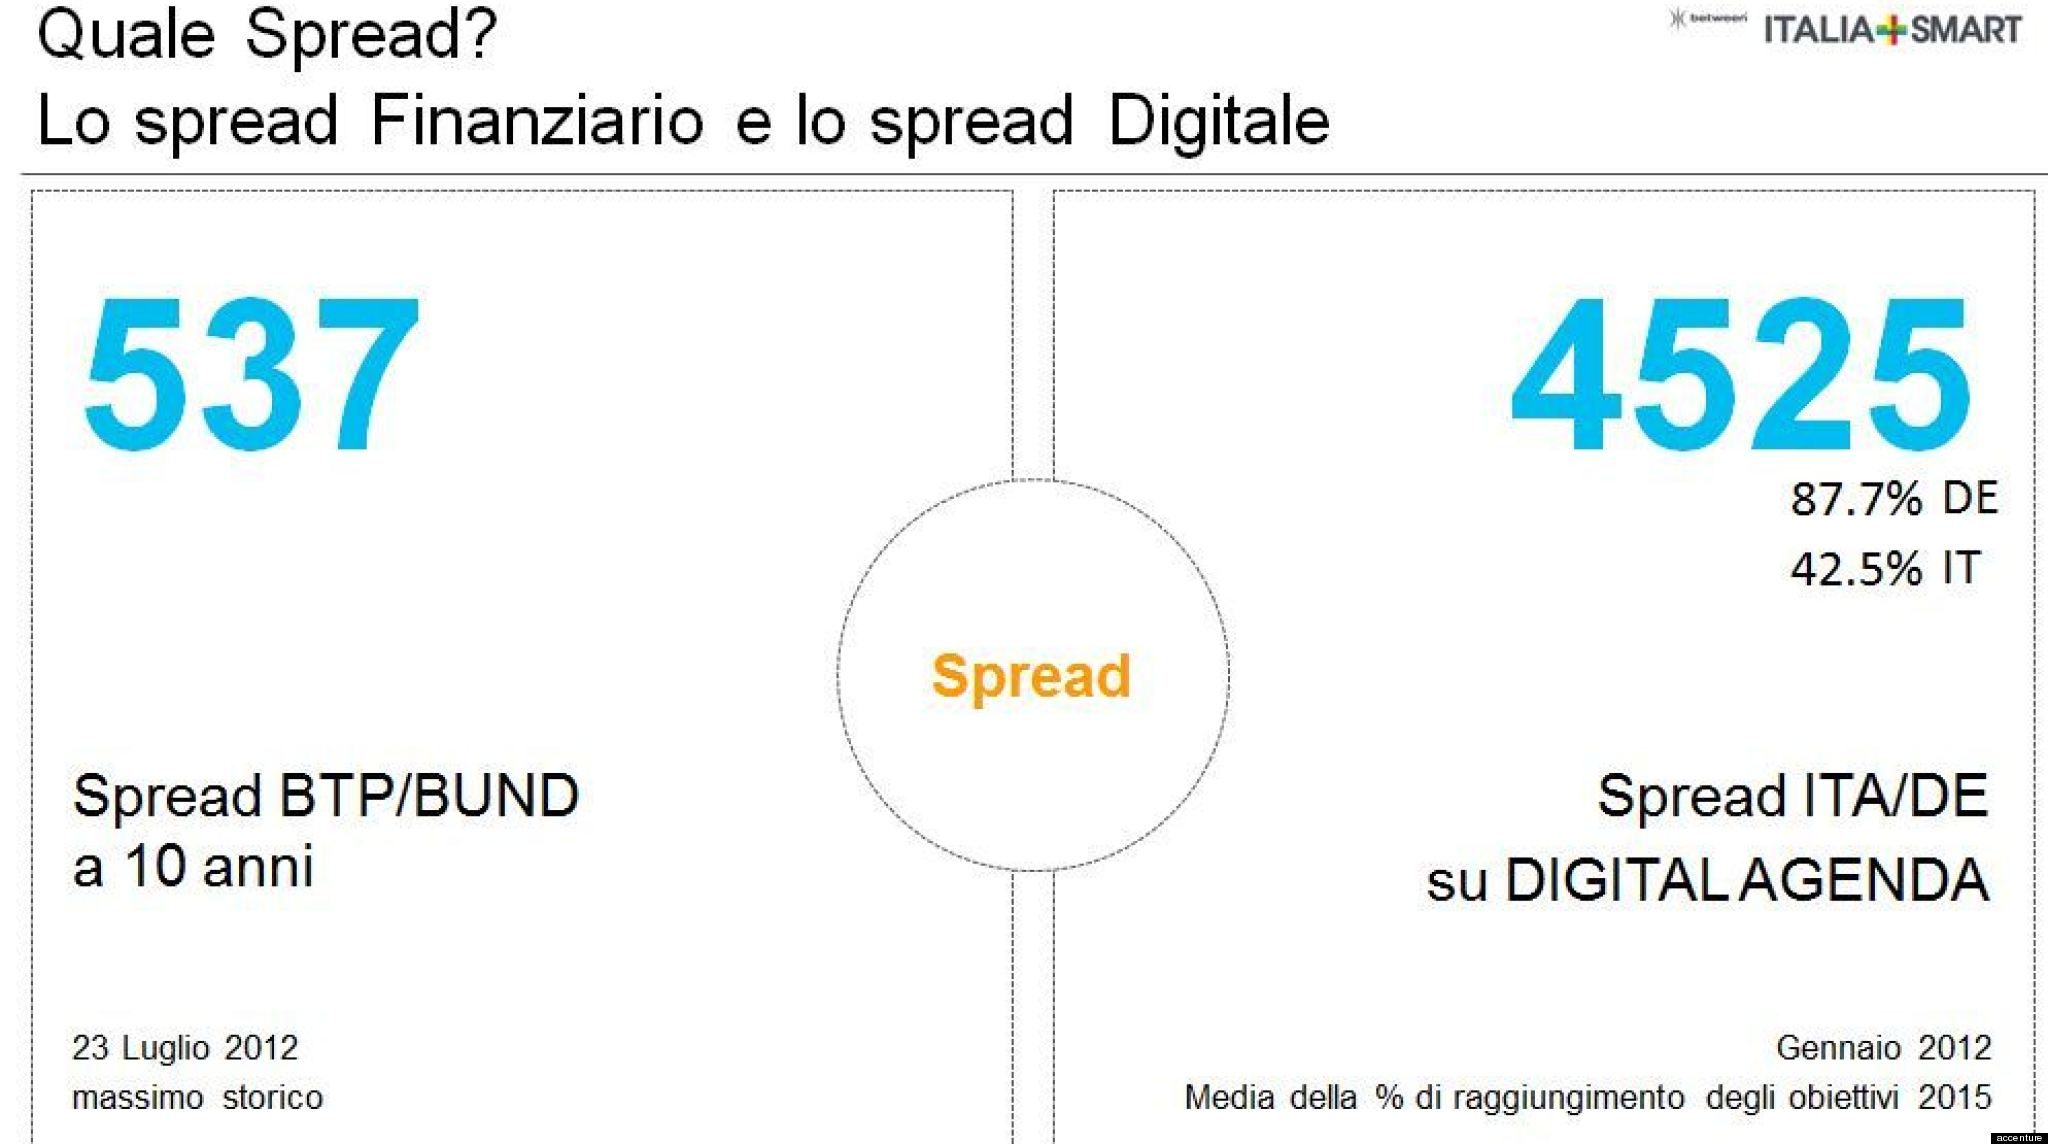 spread digitale